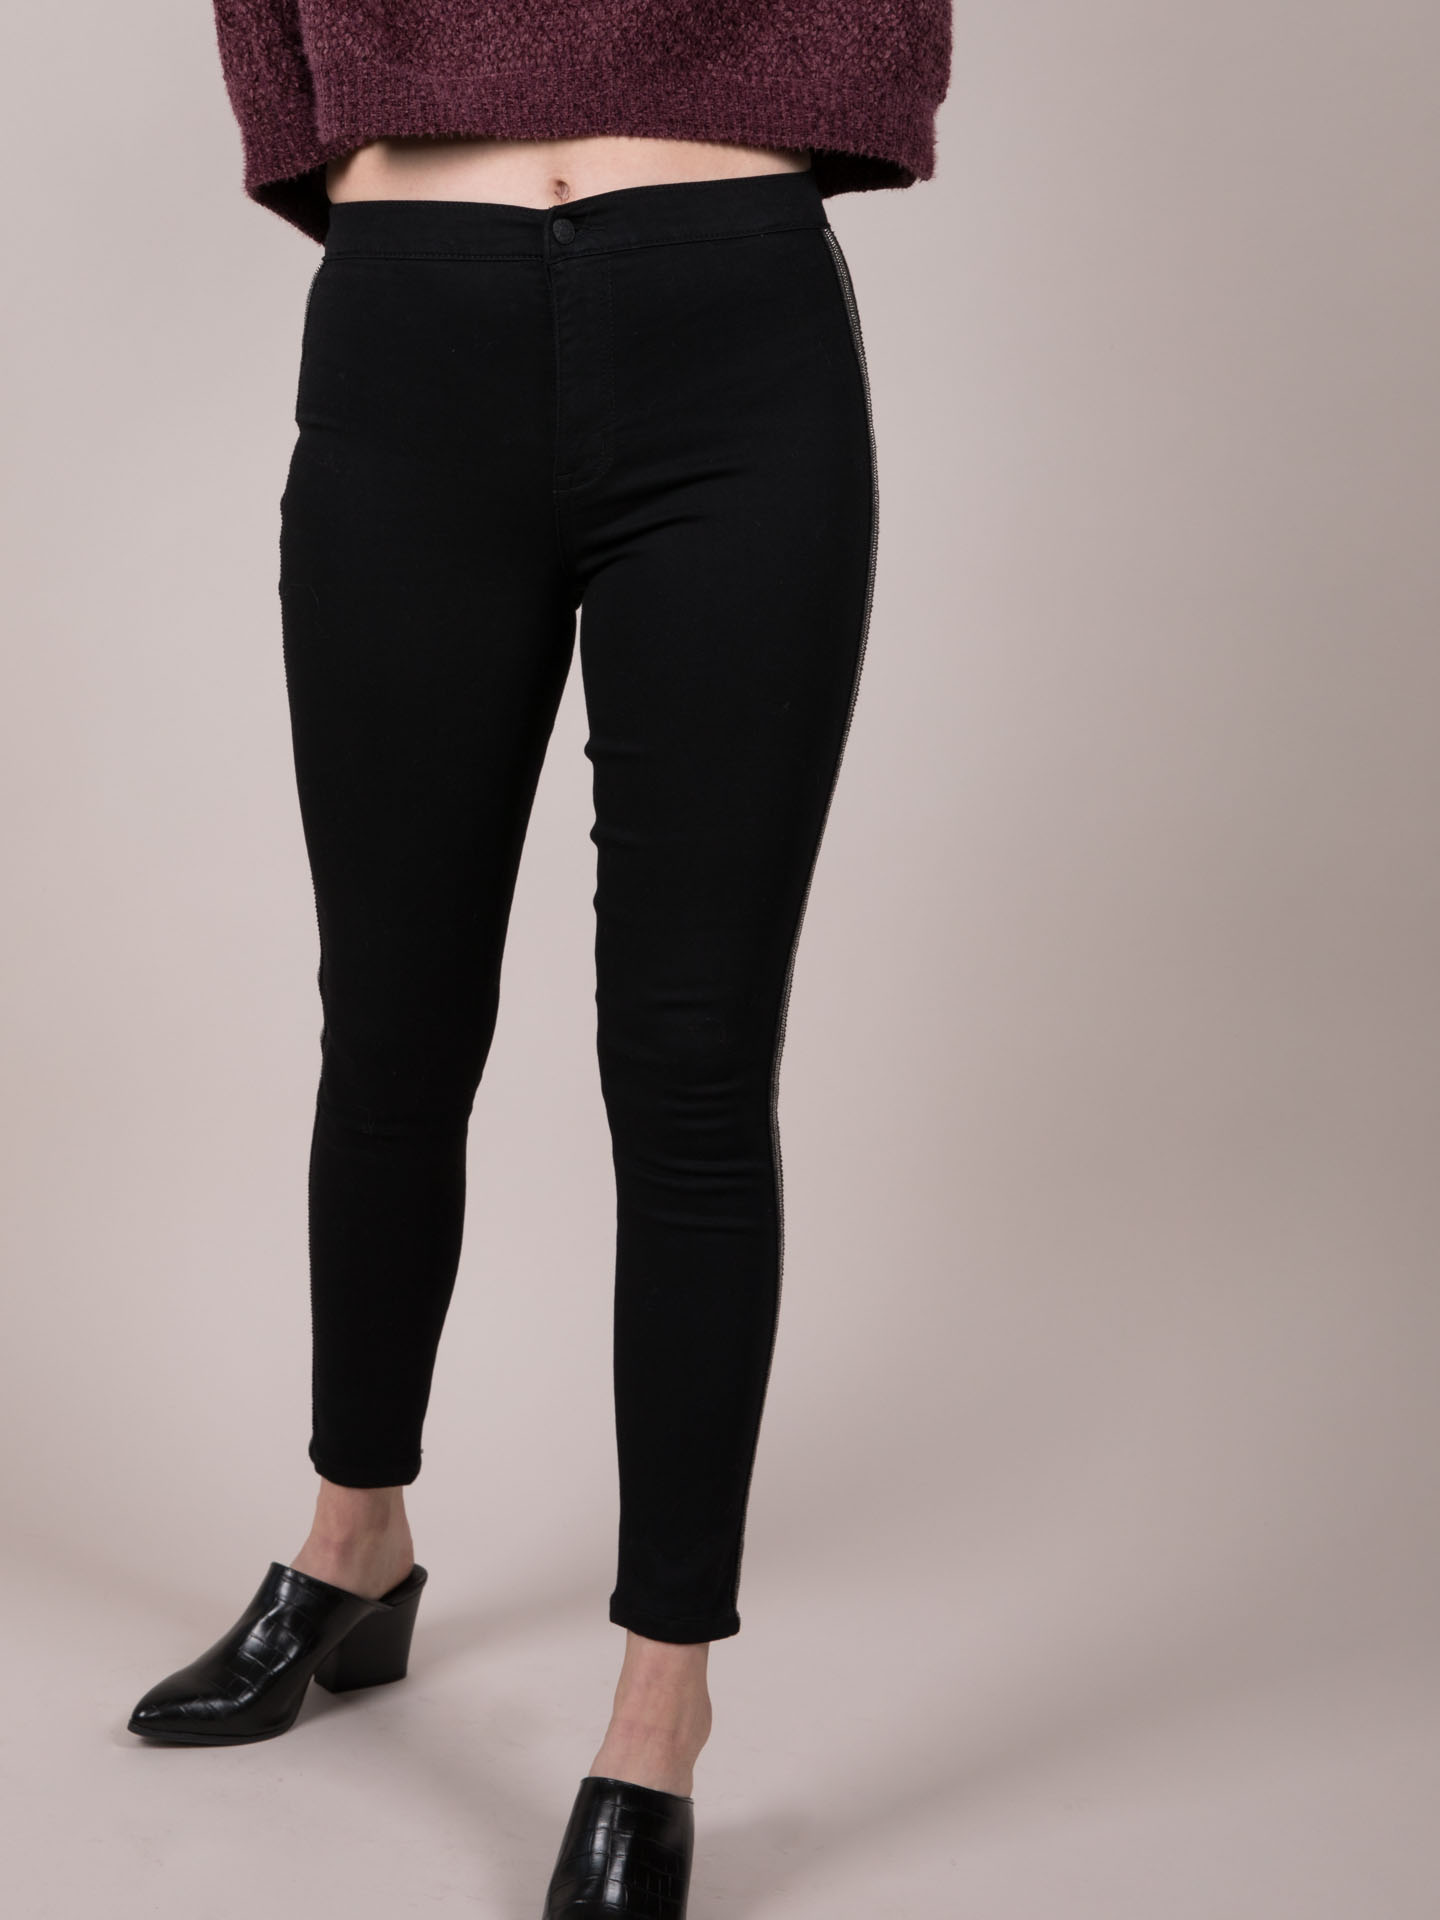 Party Pants Sequin Side Stripe Jean Black